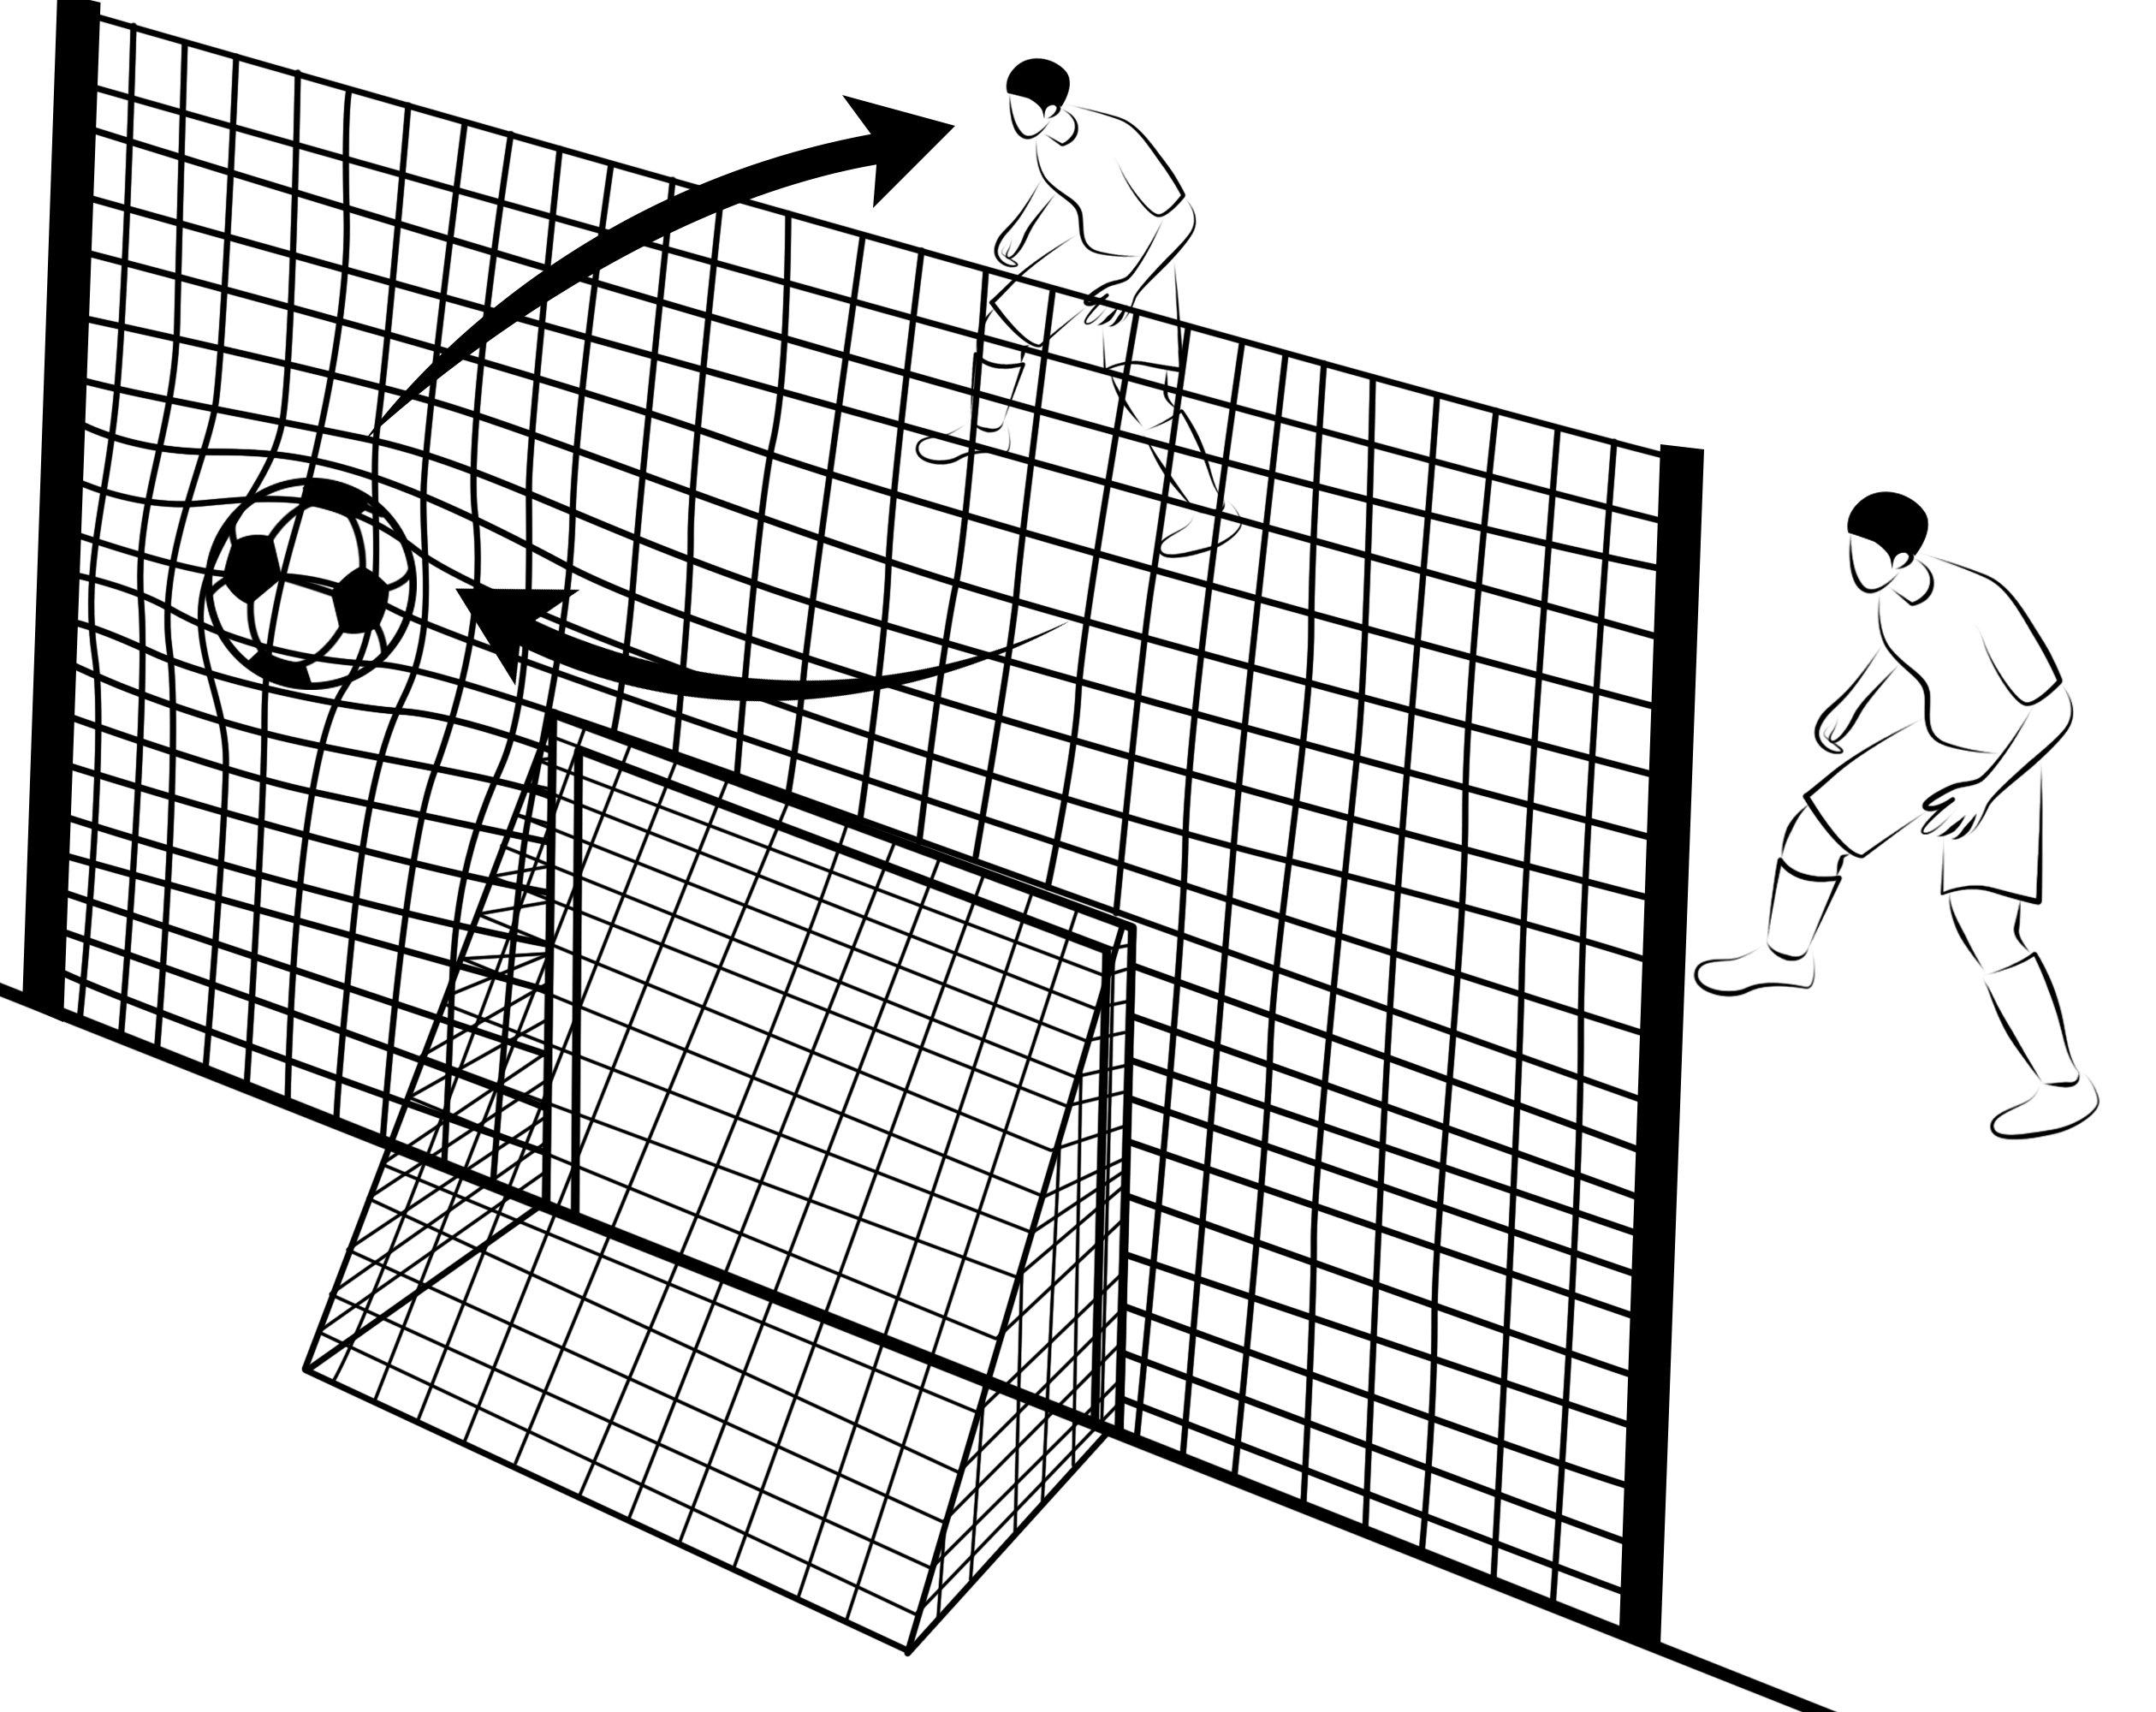 Open Goaaal Soccer Rebounder/Goal/Backstop All-in-One (Large)